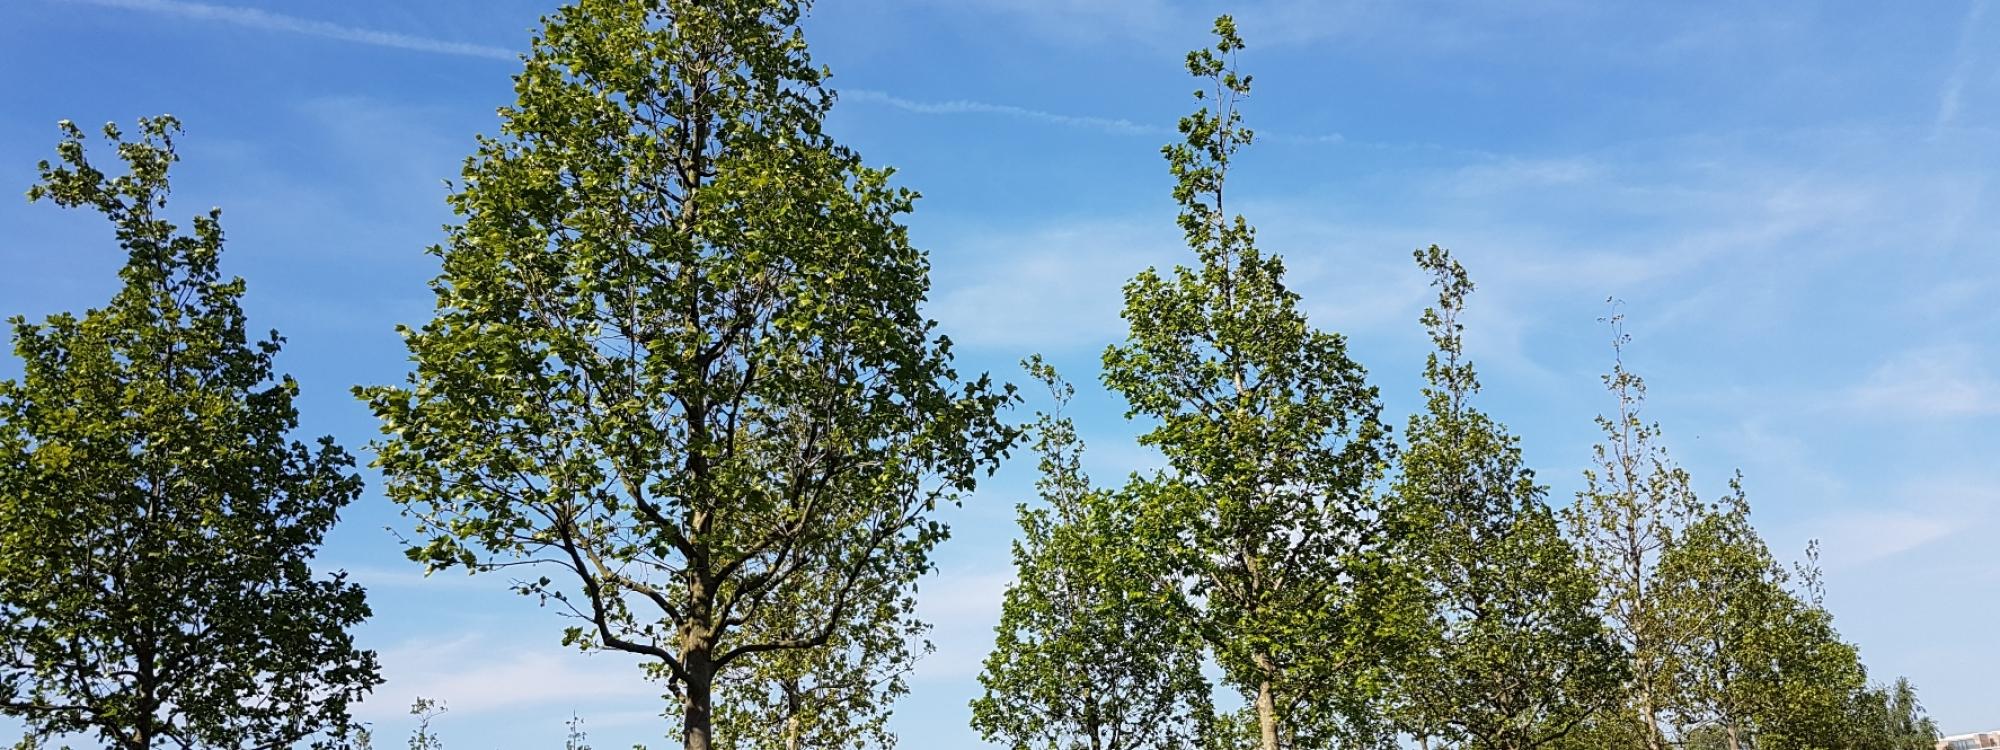 Stratford Trees 2